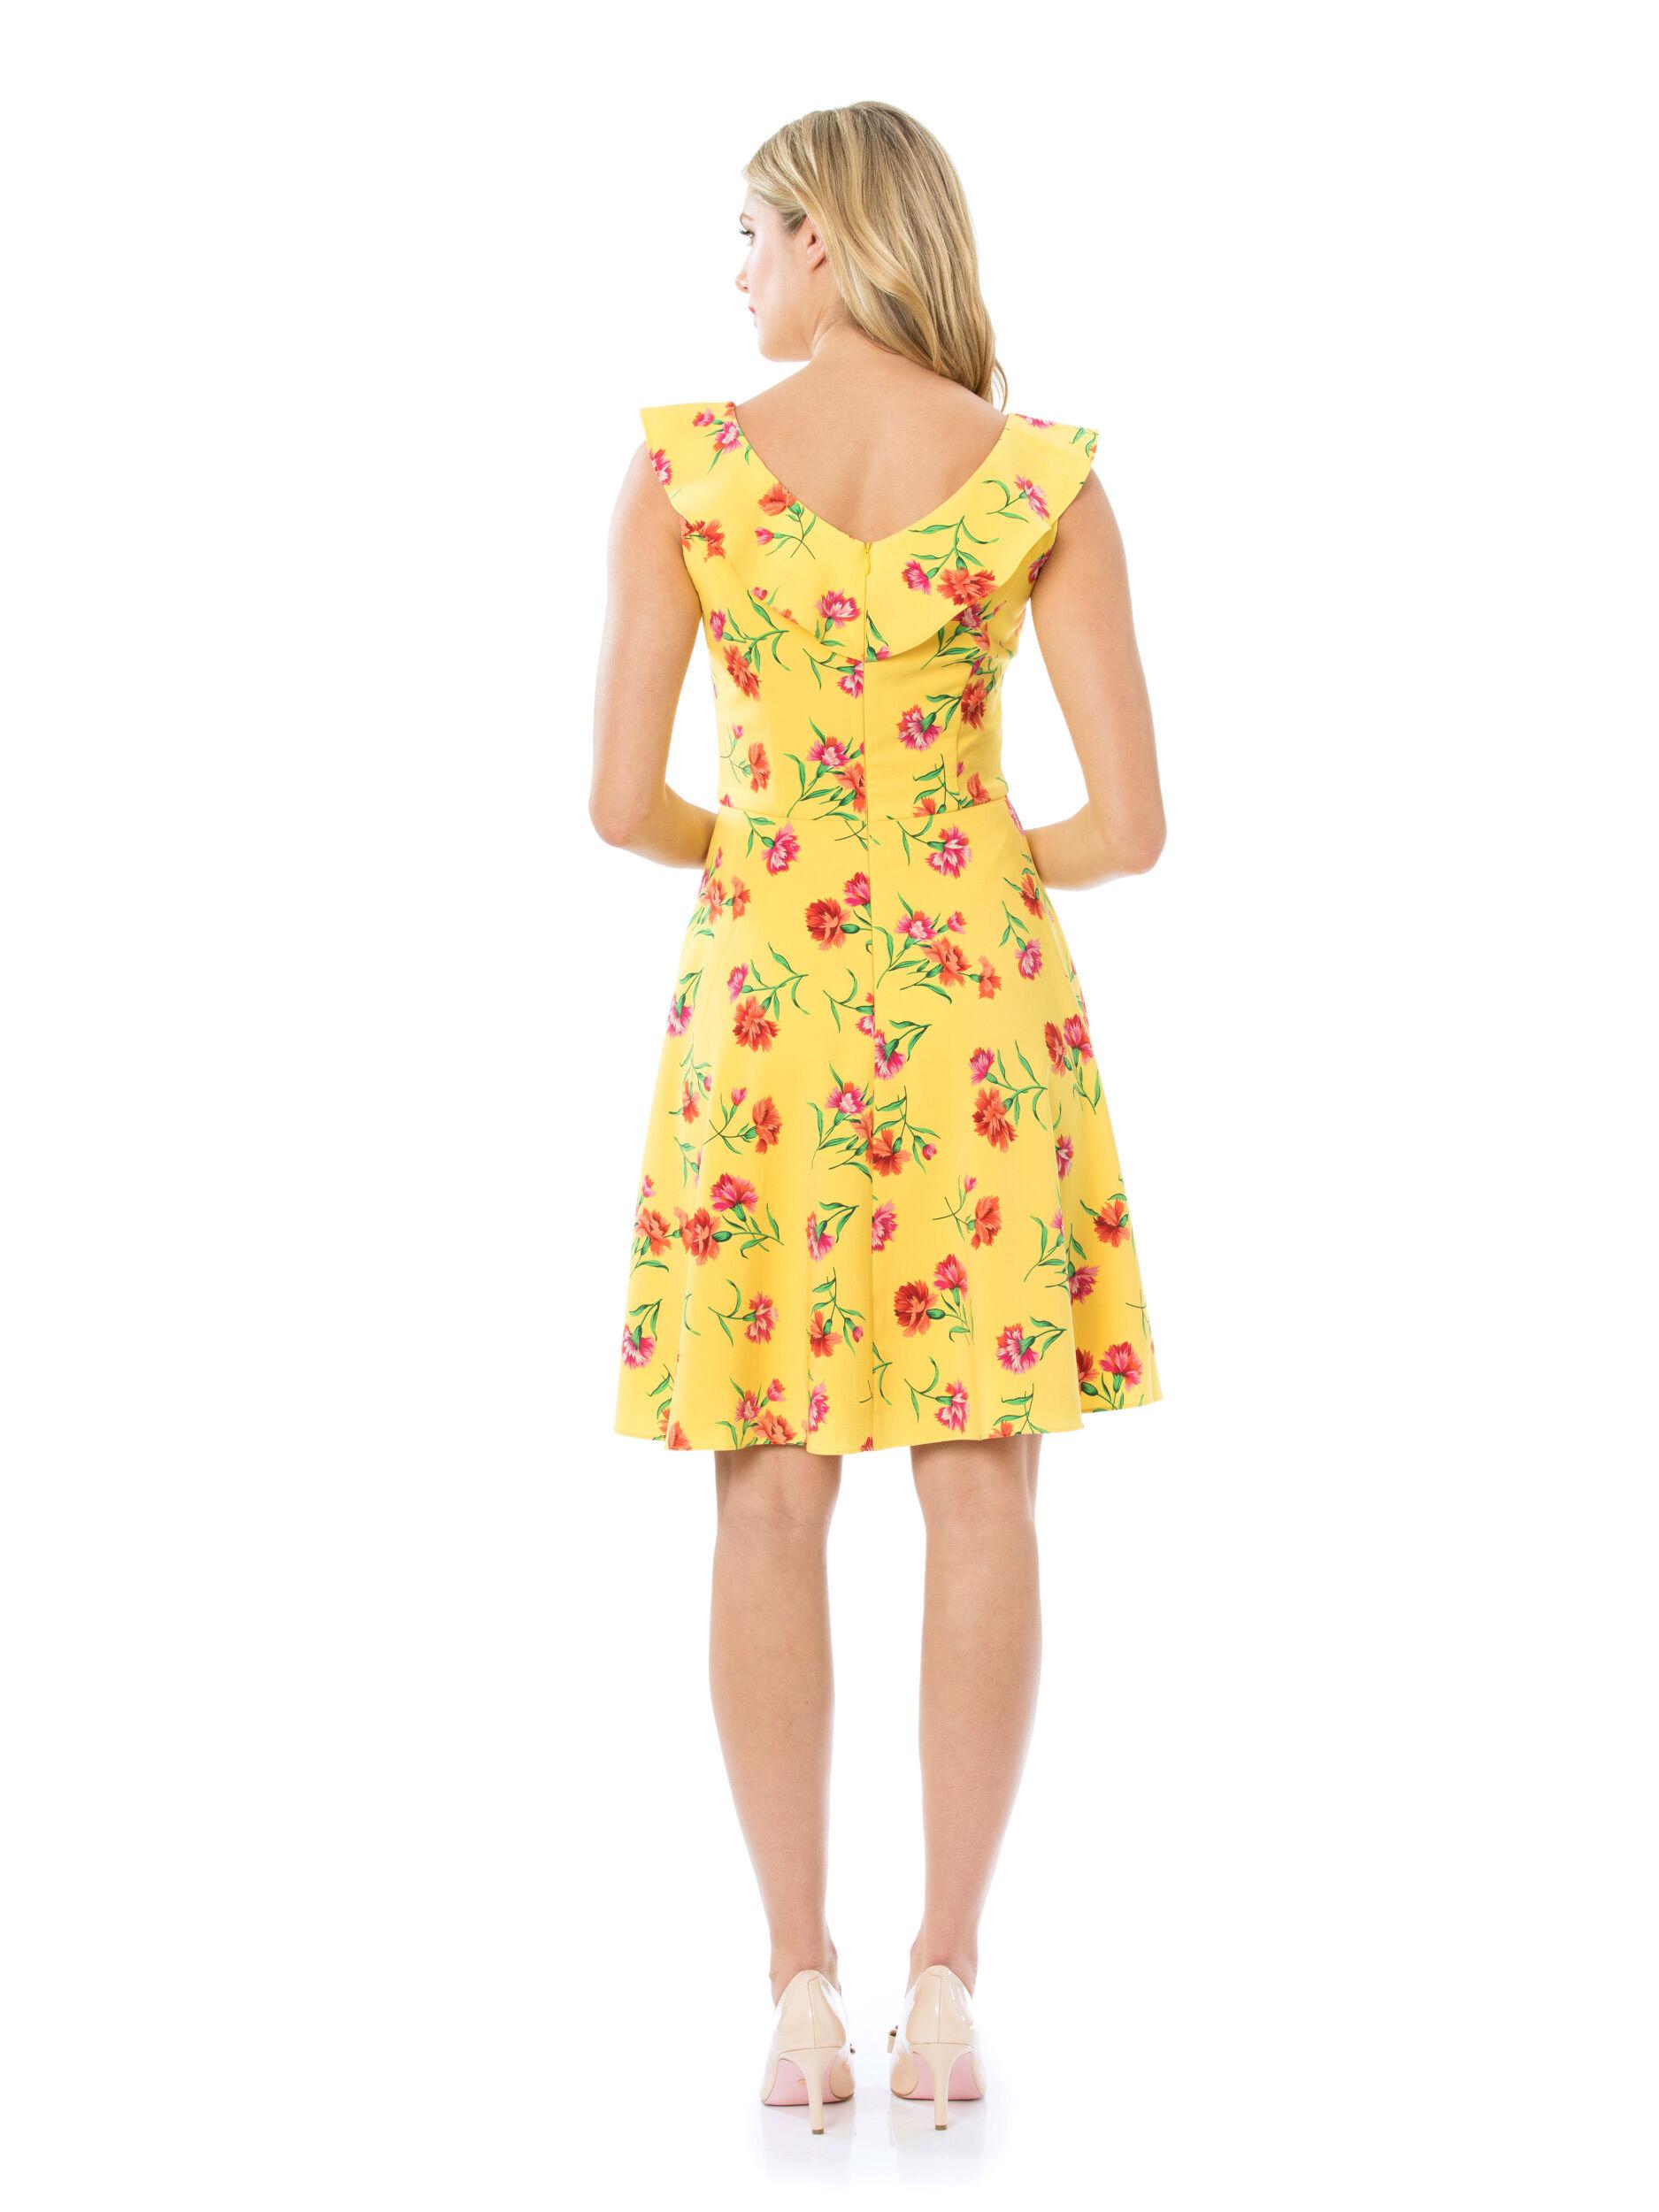 La Vida Loca Dress